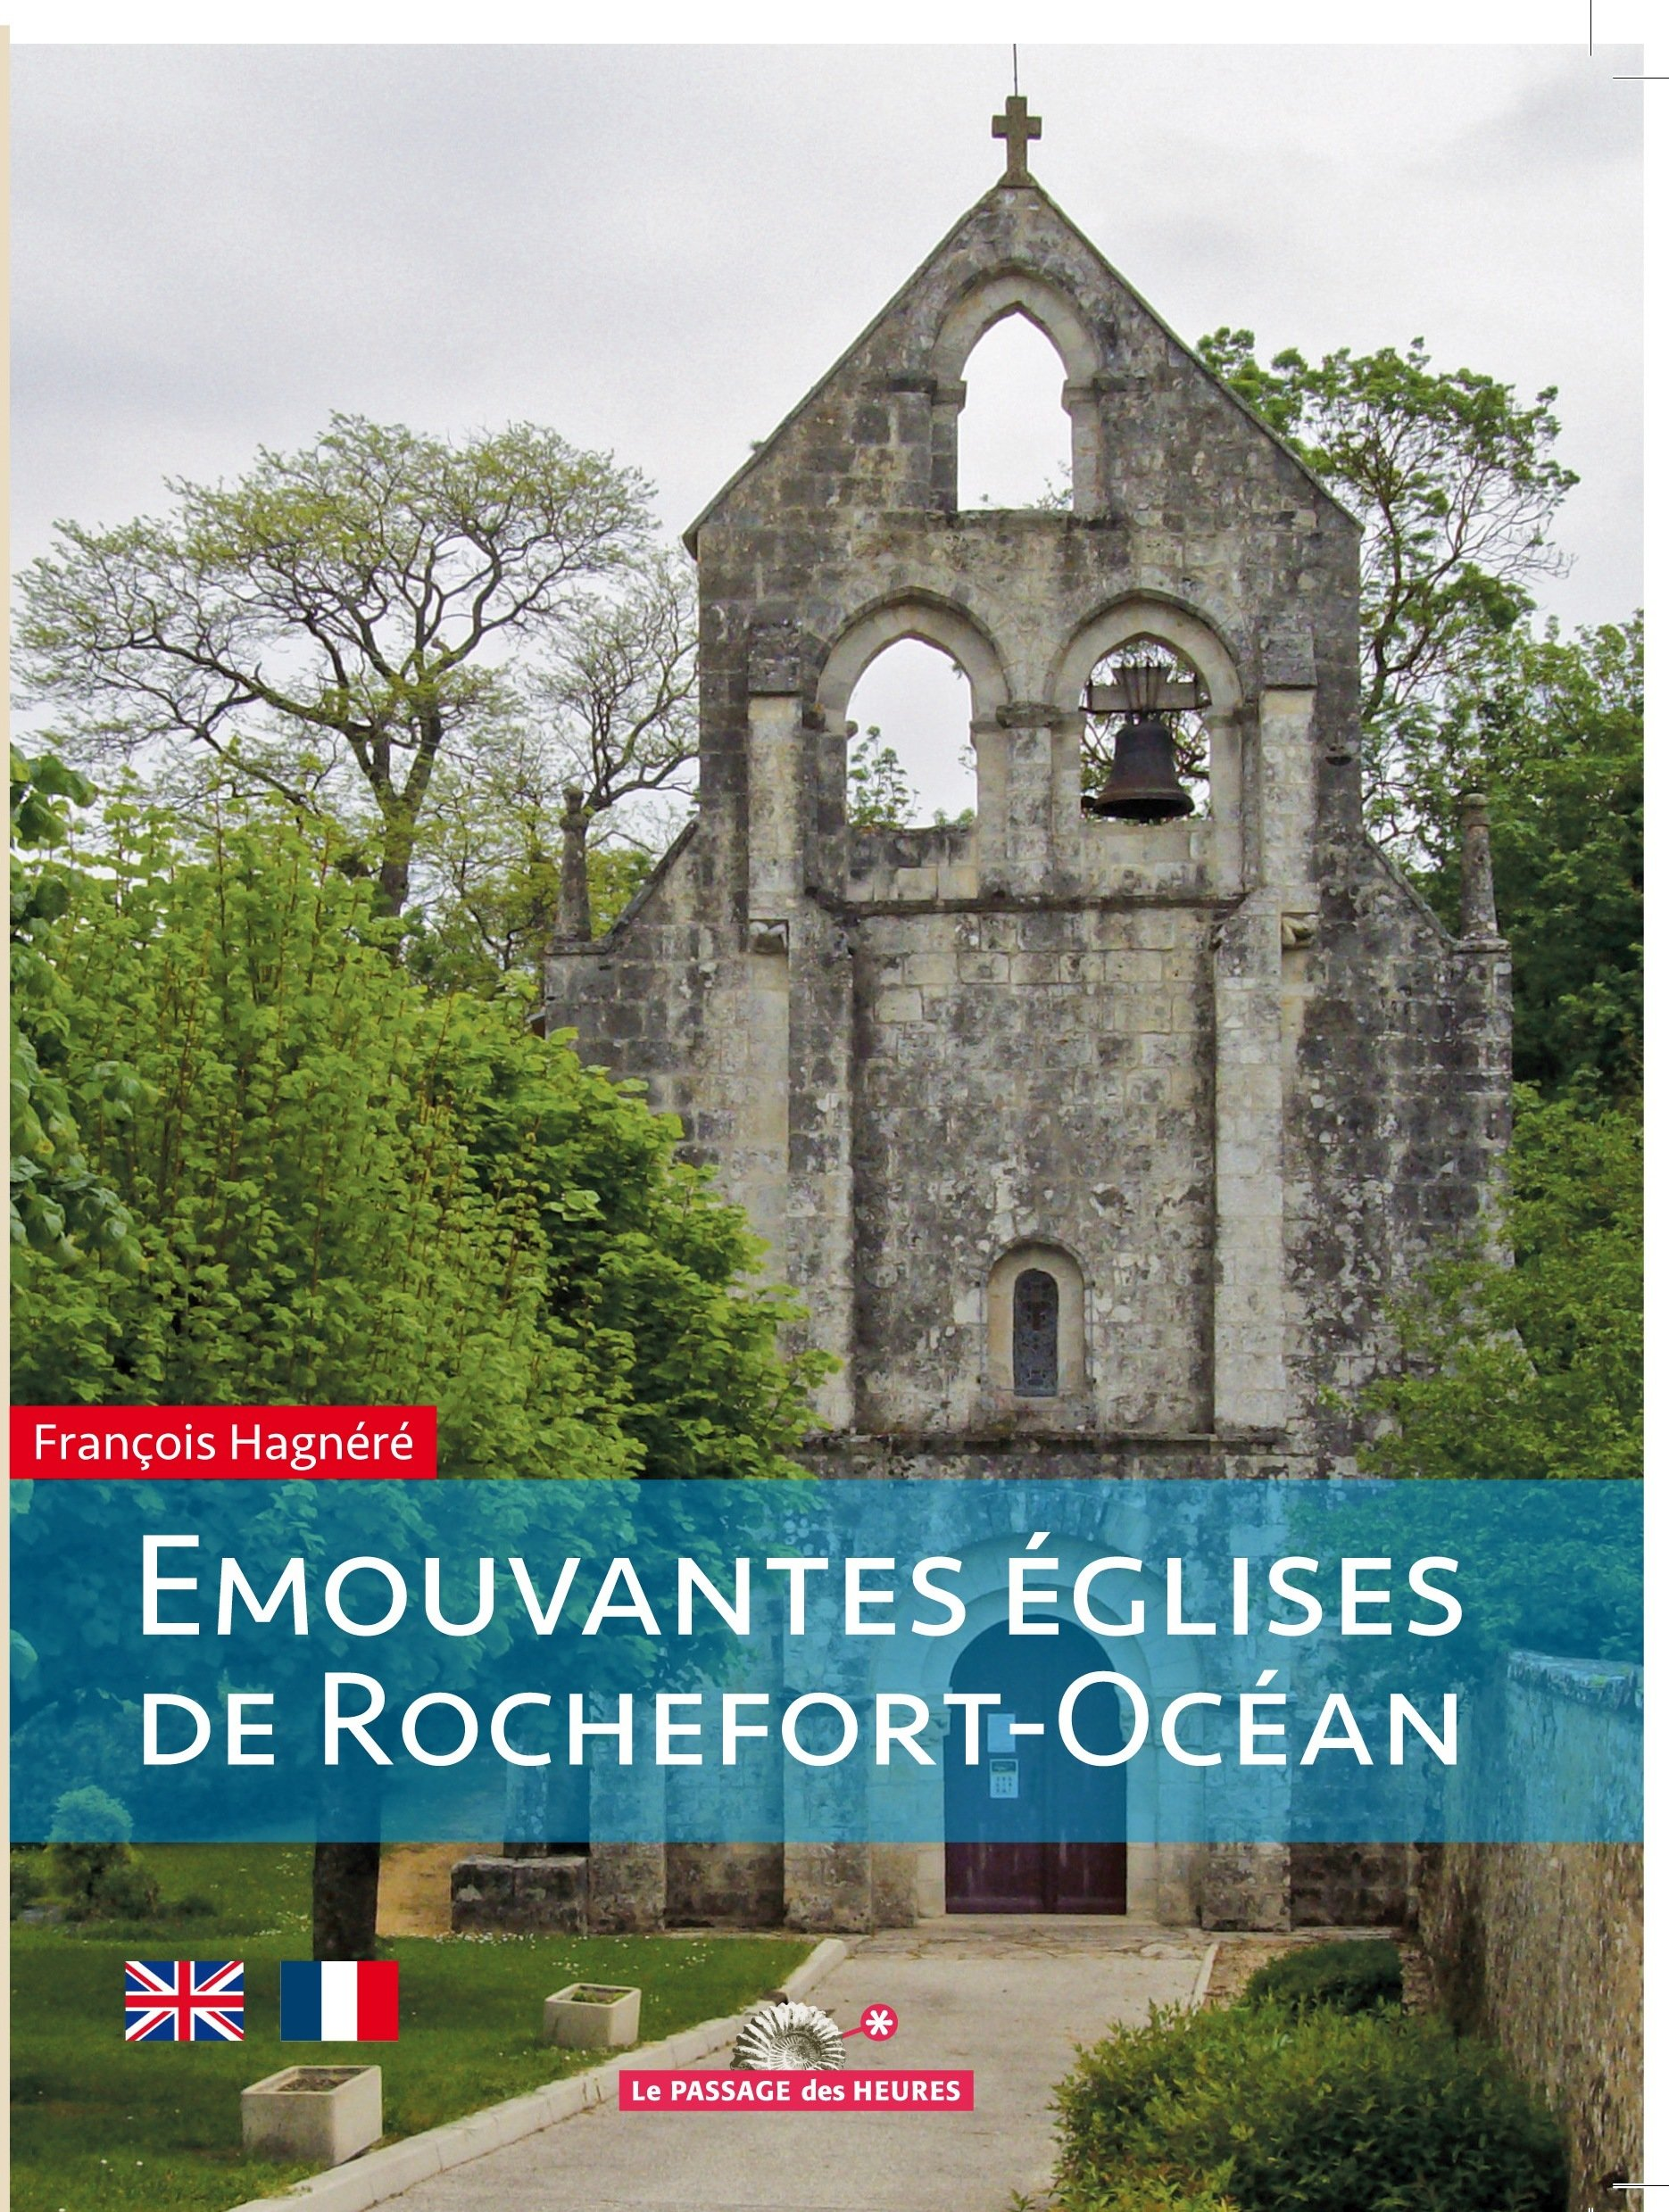 Emouvantes Eglises de Rochefort-Océan 0091